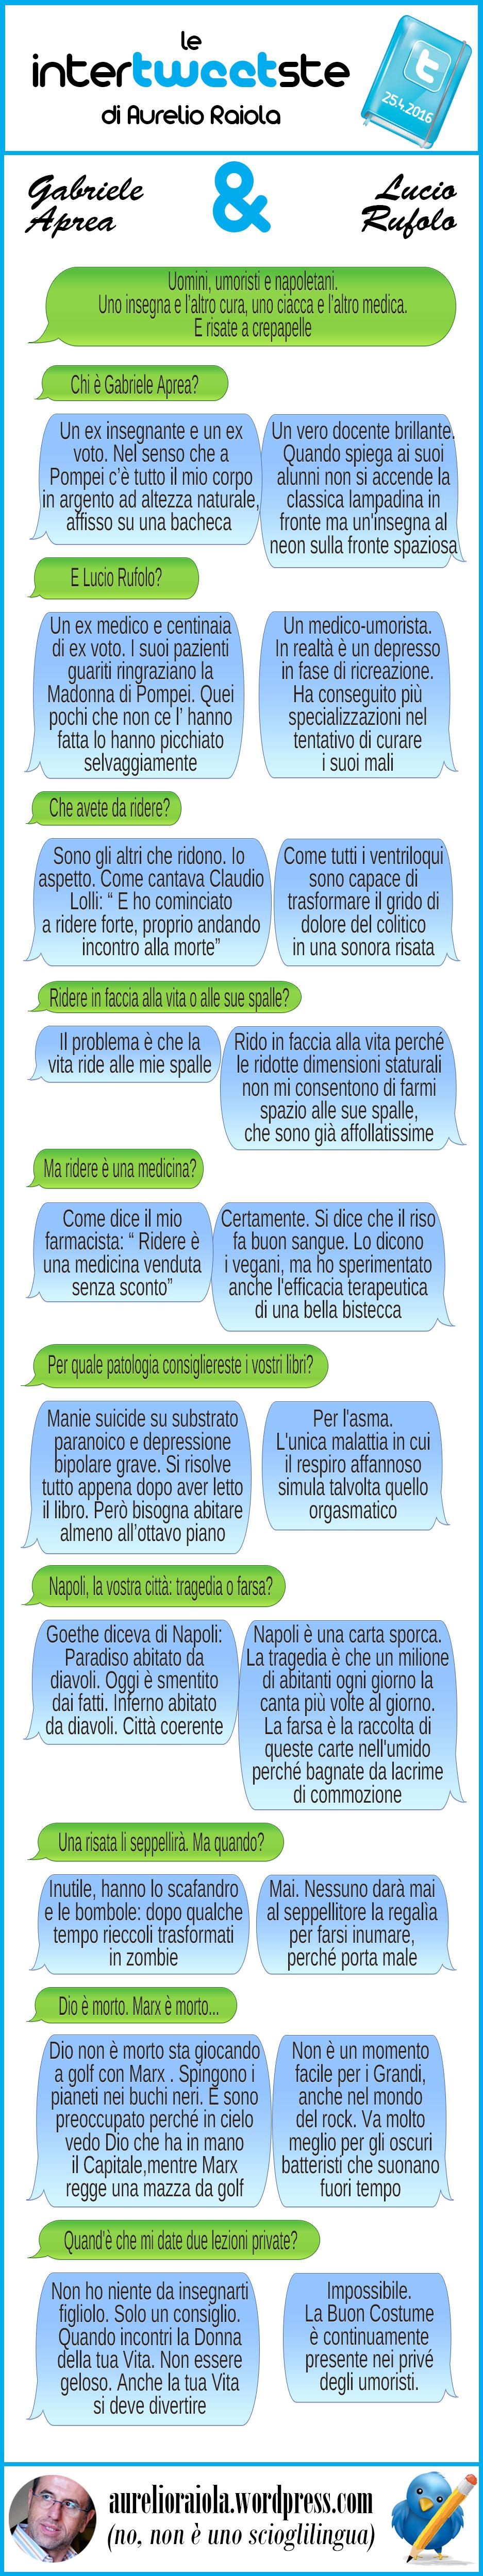 20160425-Intertweetste-Gabriela-Aprea-e-Lucio-Rufolo